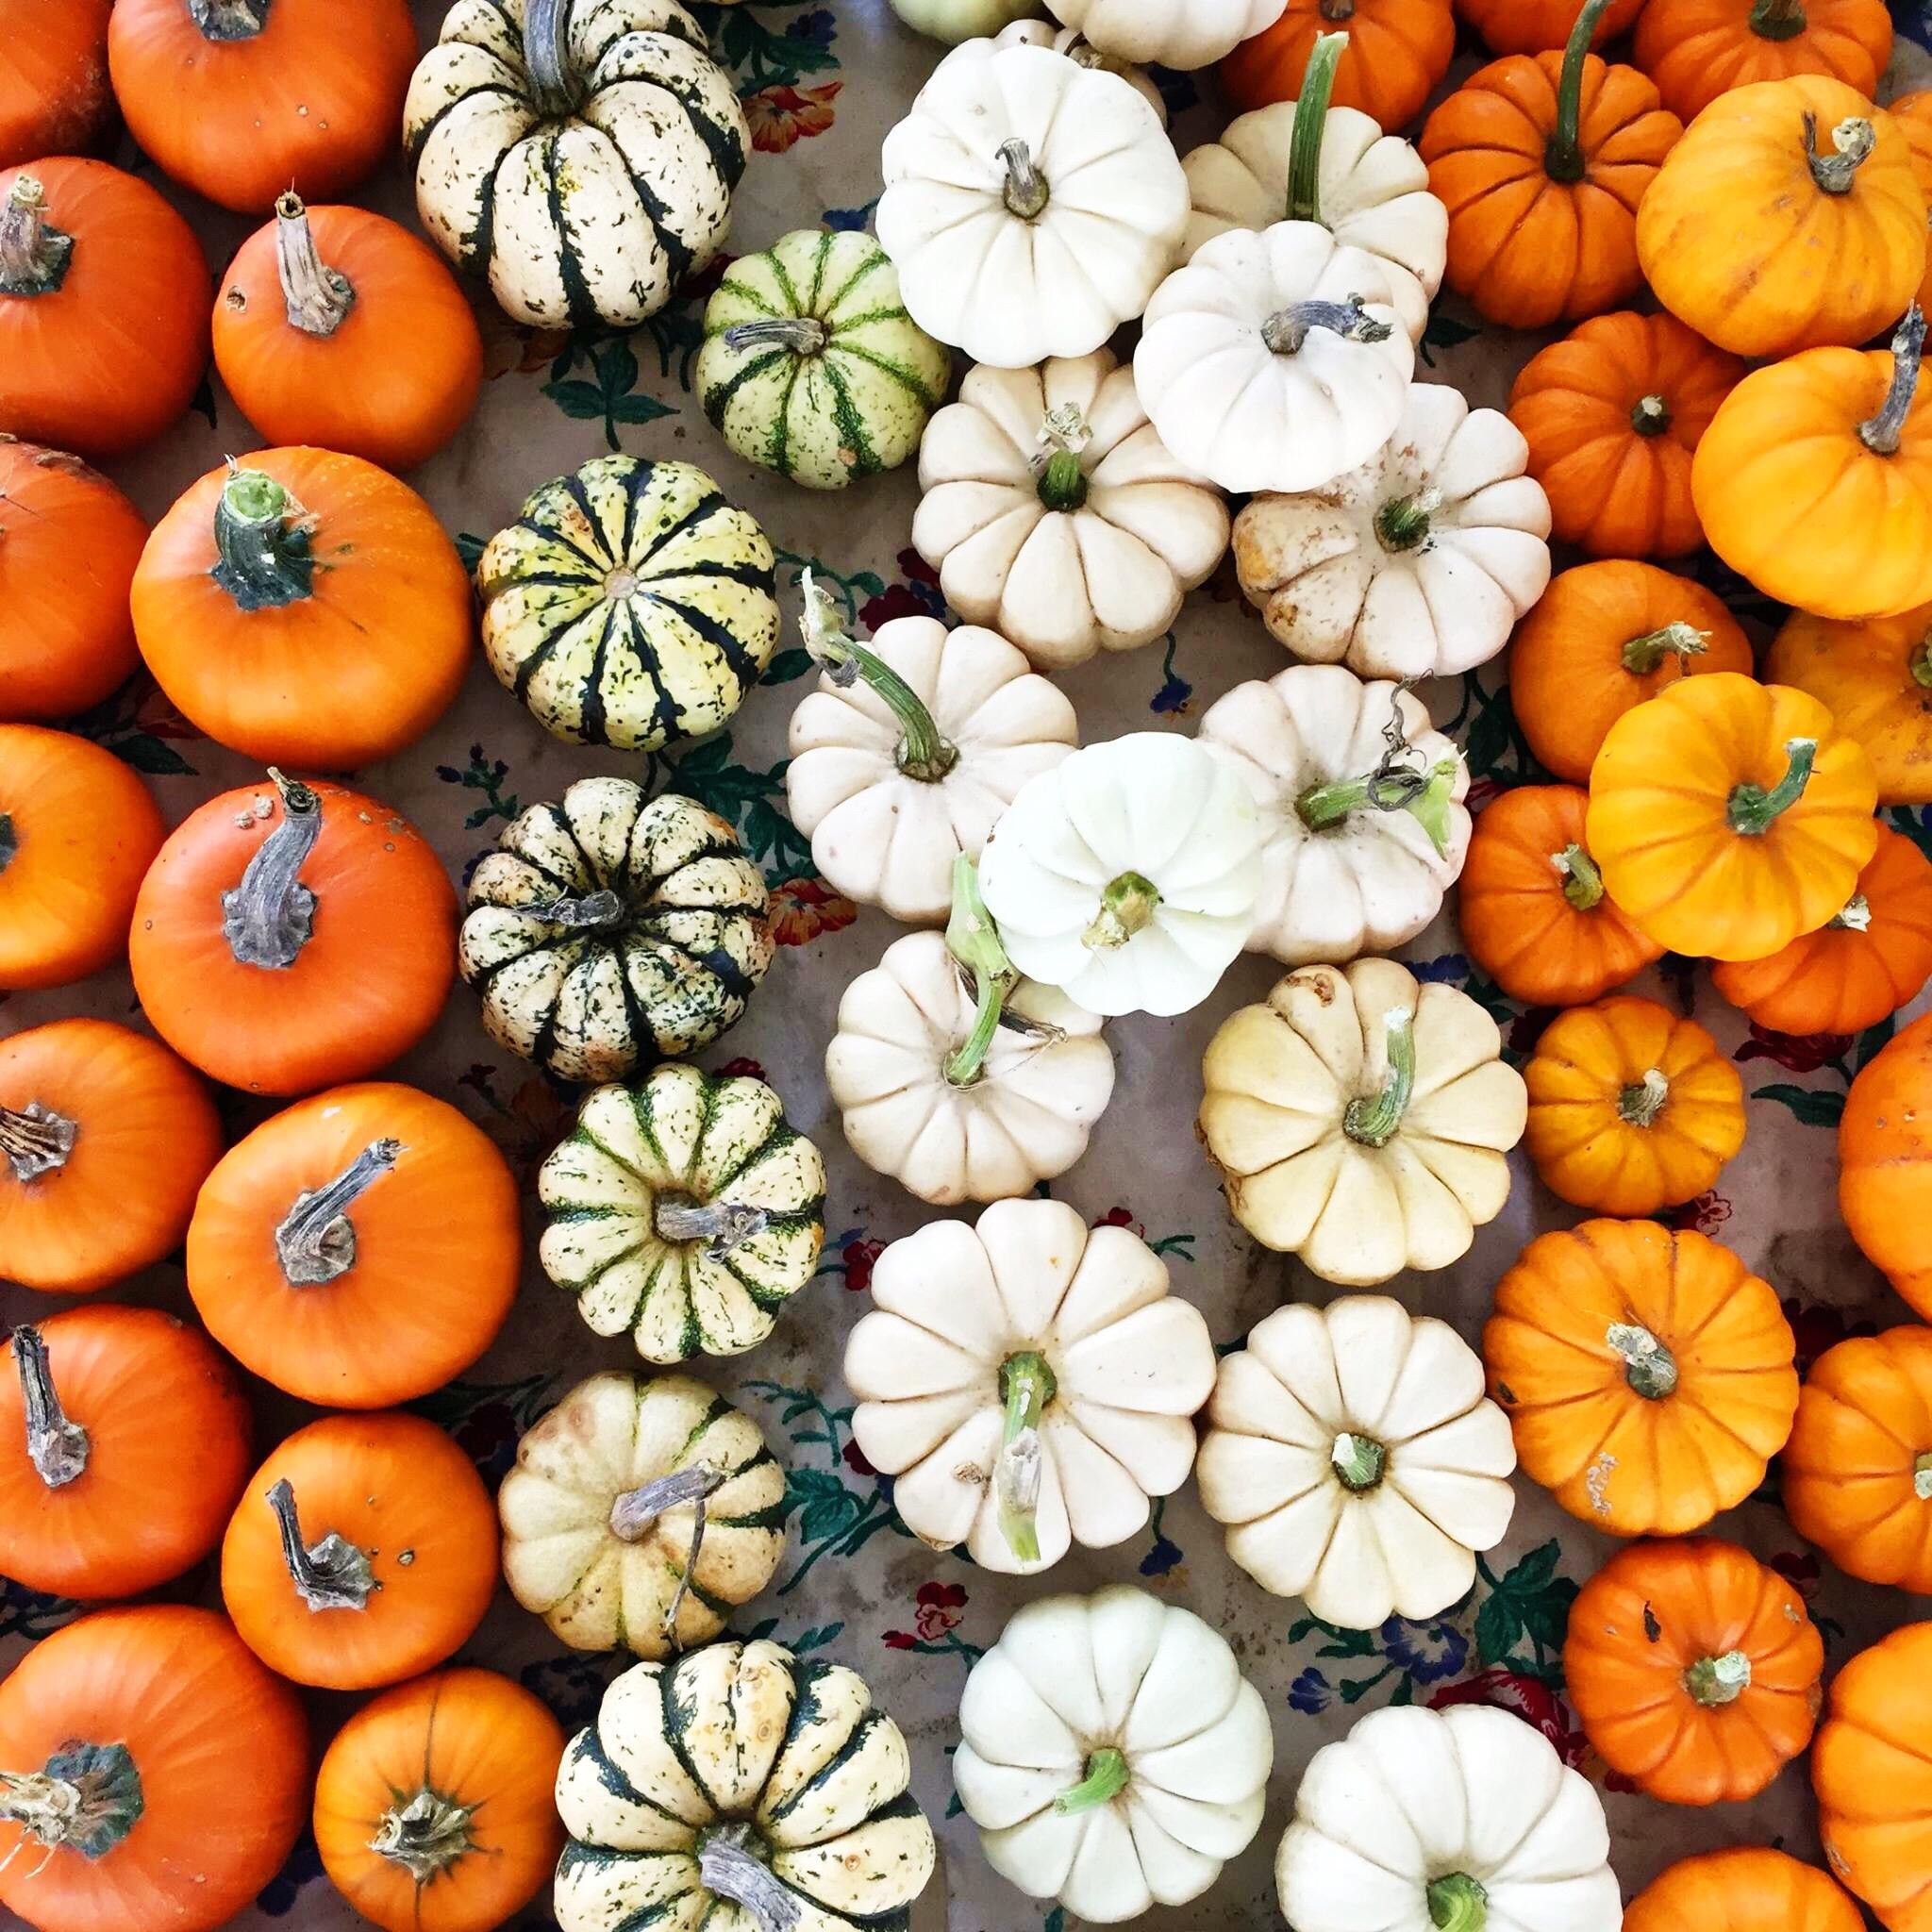 pumpkin spice body oil packaging - organic, cruelty free cosmetics